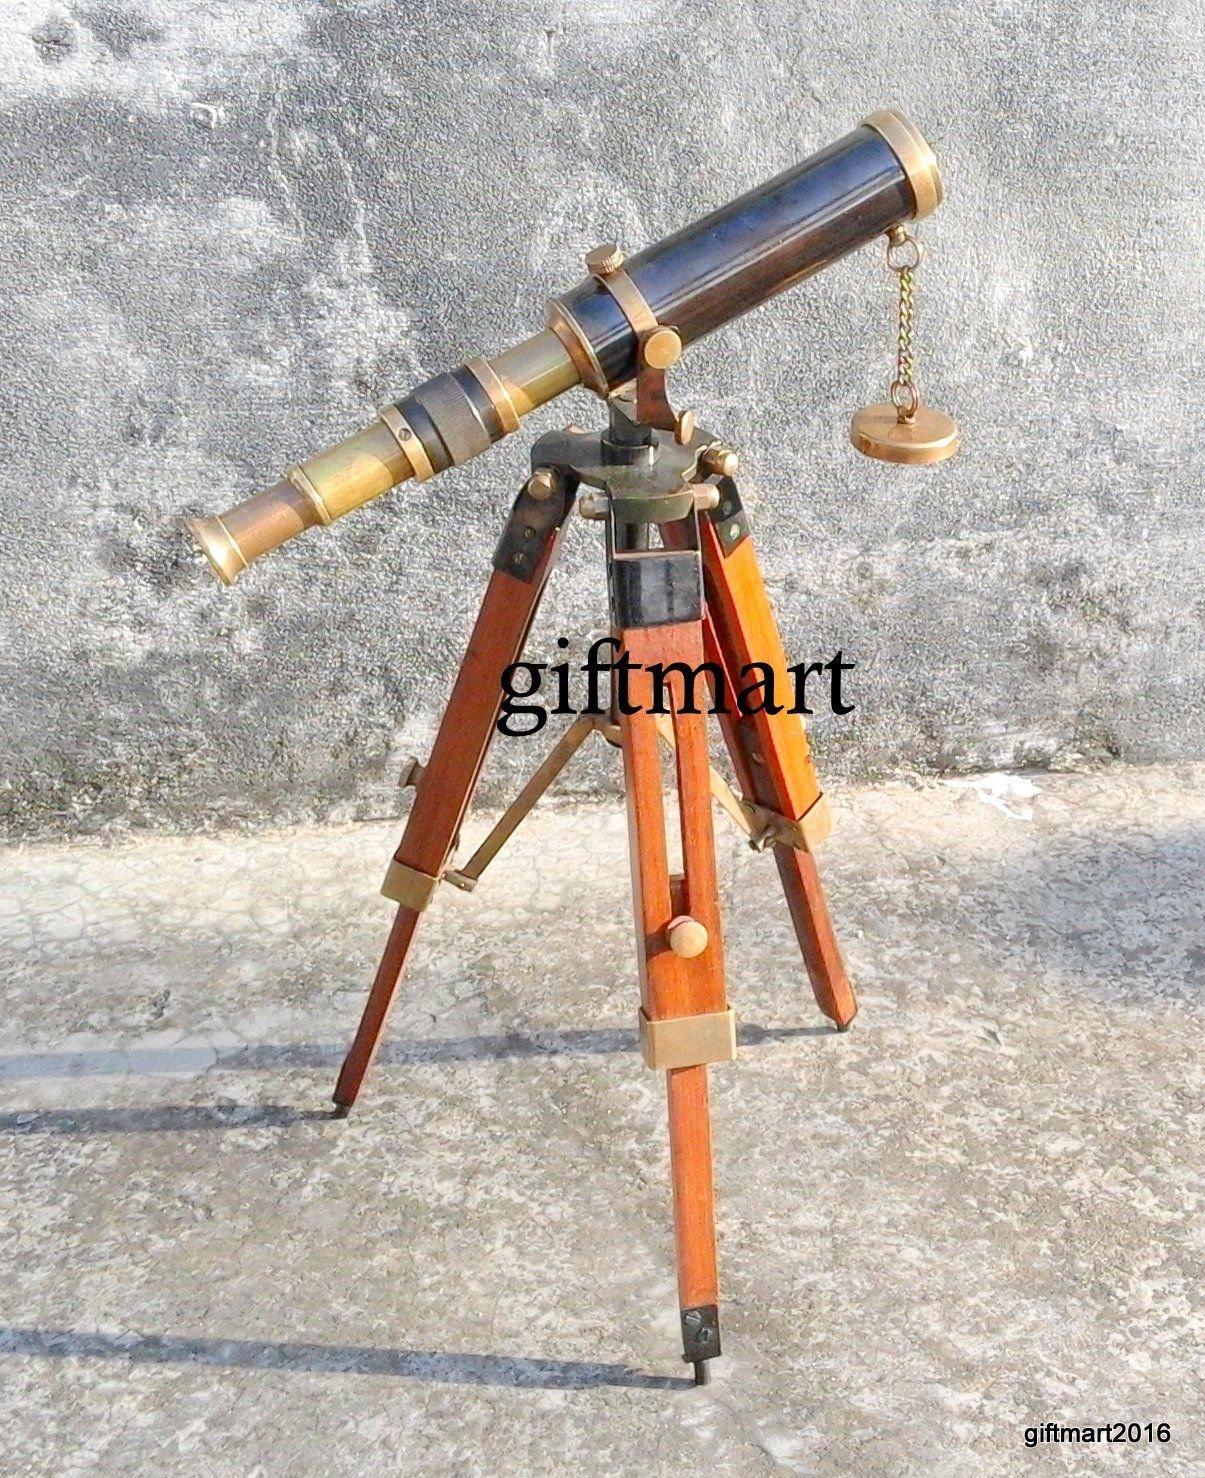 Arsh Nautical Marine Navy Nautical Brass Telescope with Tripod Stand Handmade Vintage Spyglass B by Arsh Nautical